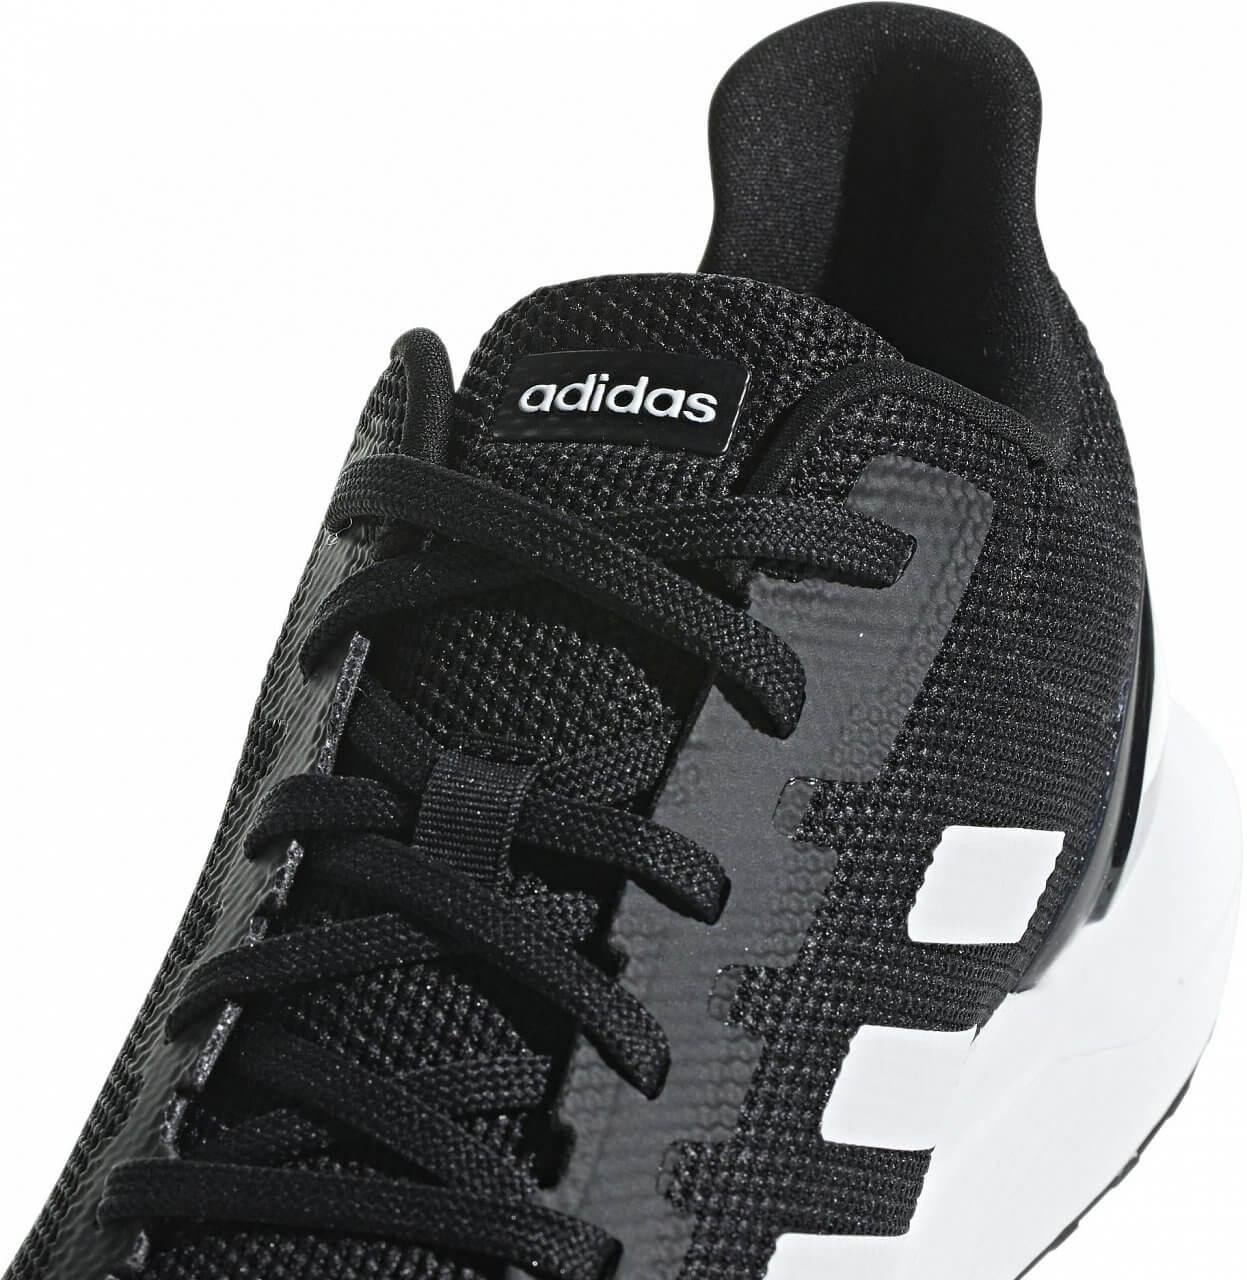 adidas Cosmic 2 - pánske bežecké topánky  fa0af0fc5c2